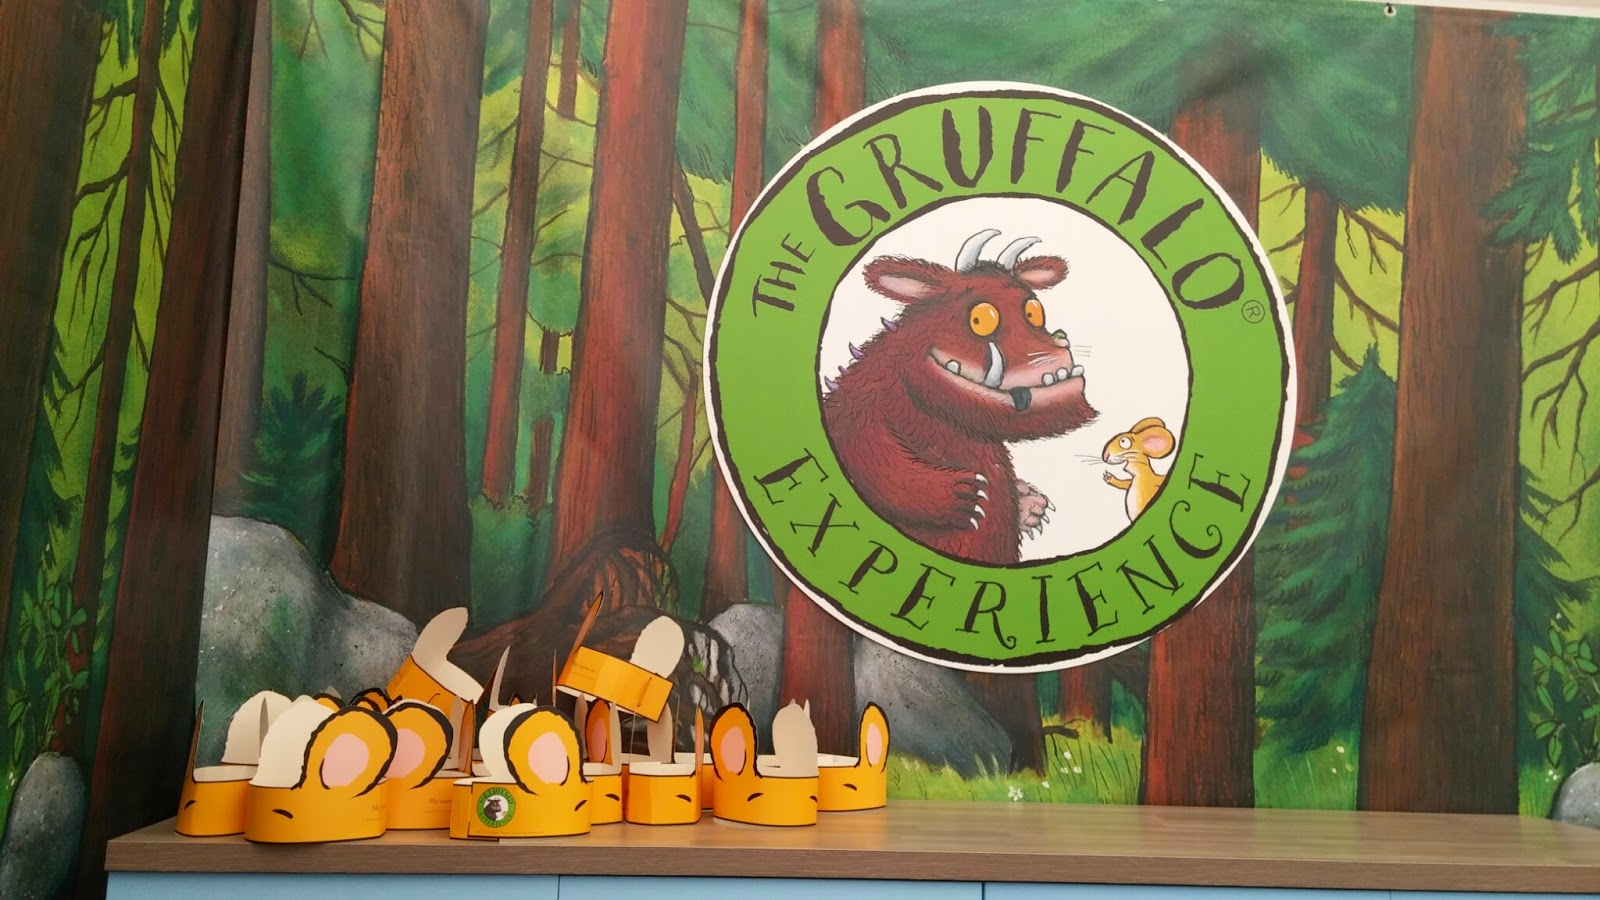 Gruffalo experience